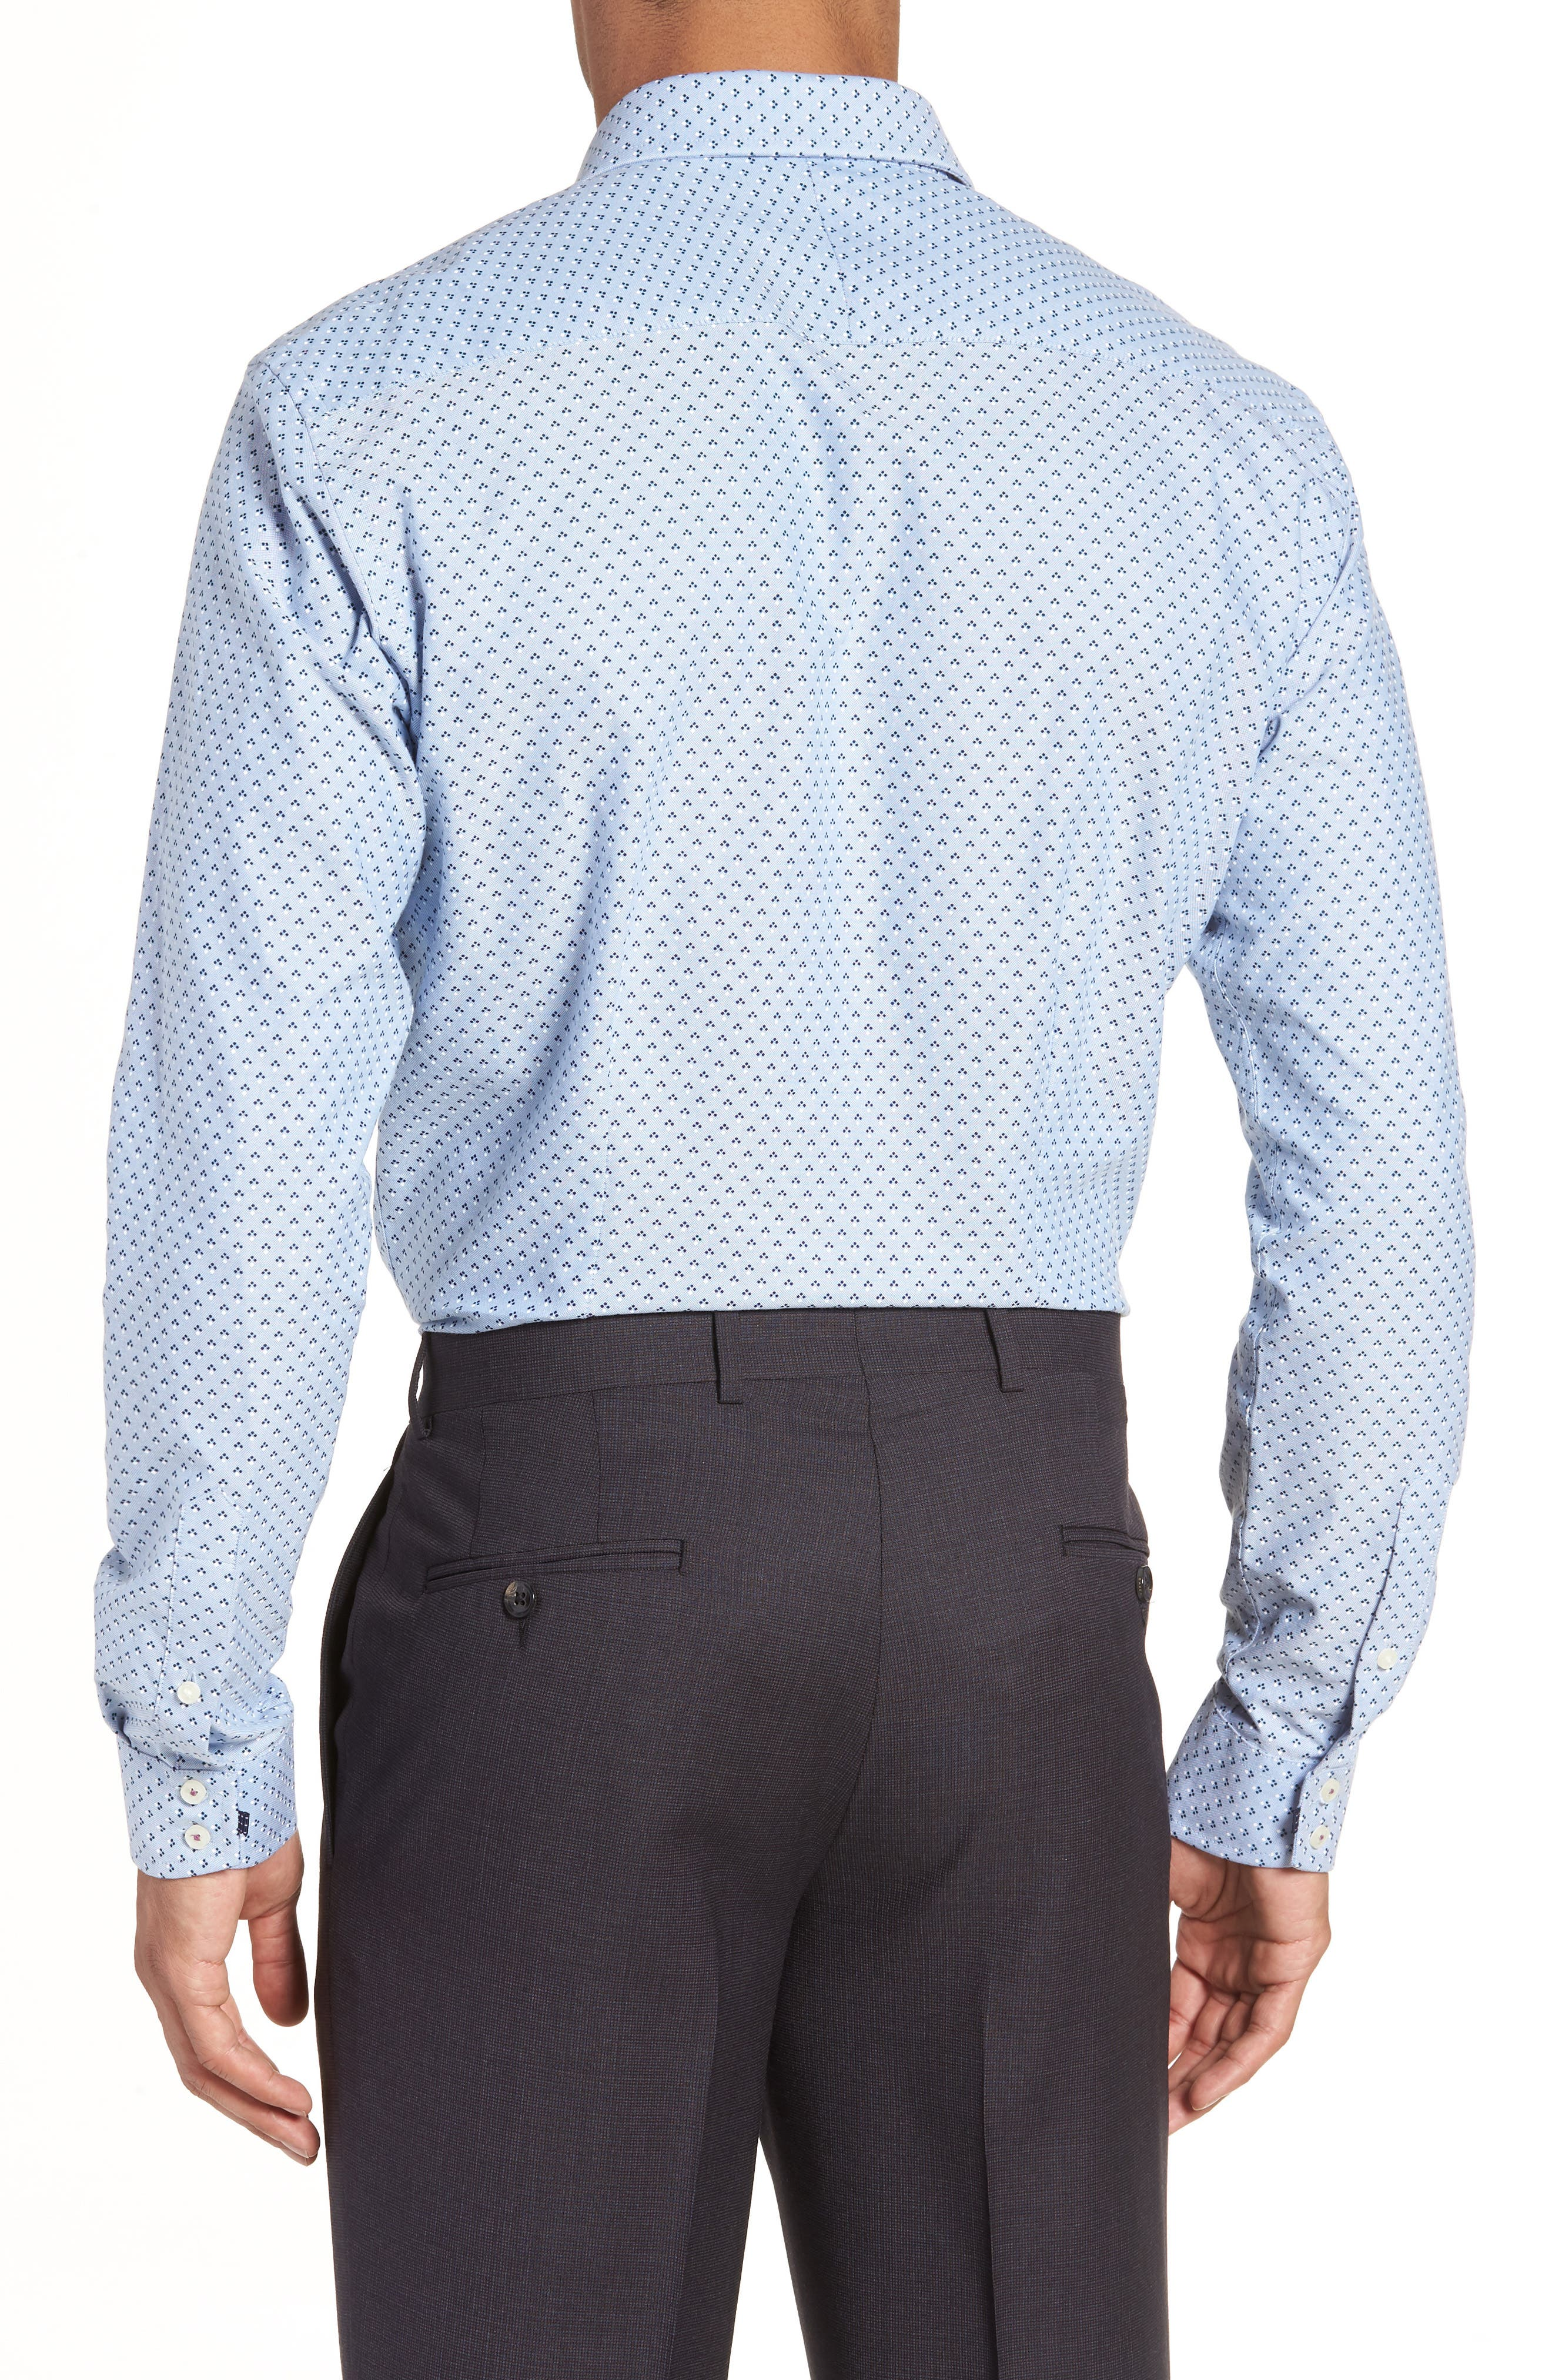 Forestr Trim Fit Geometric Dress Shirt,                             Alternate thumbnail 3, color,                             Blue